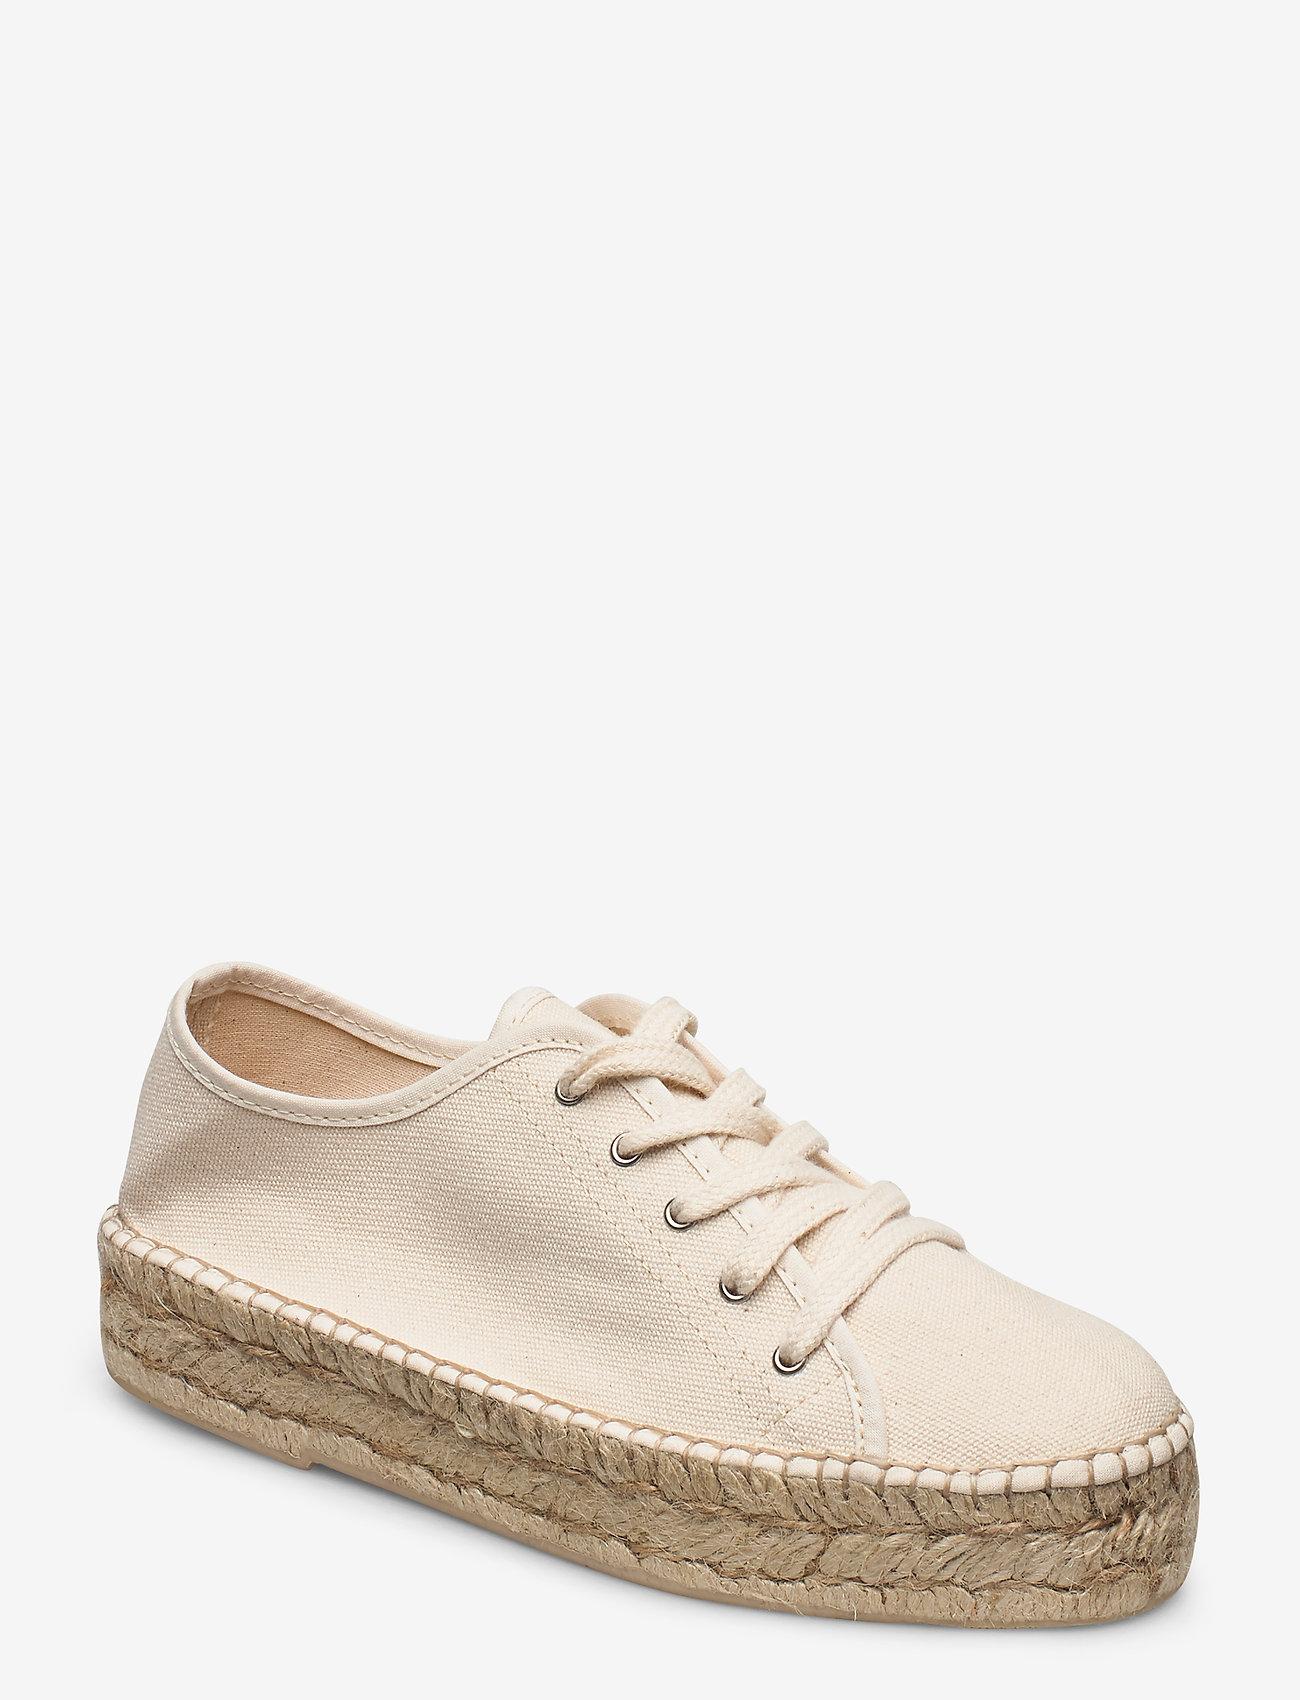 Twist & Tango - Capri Espadrille Sneakers - lage espadrilles - ecru - 0